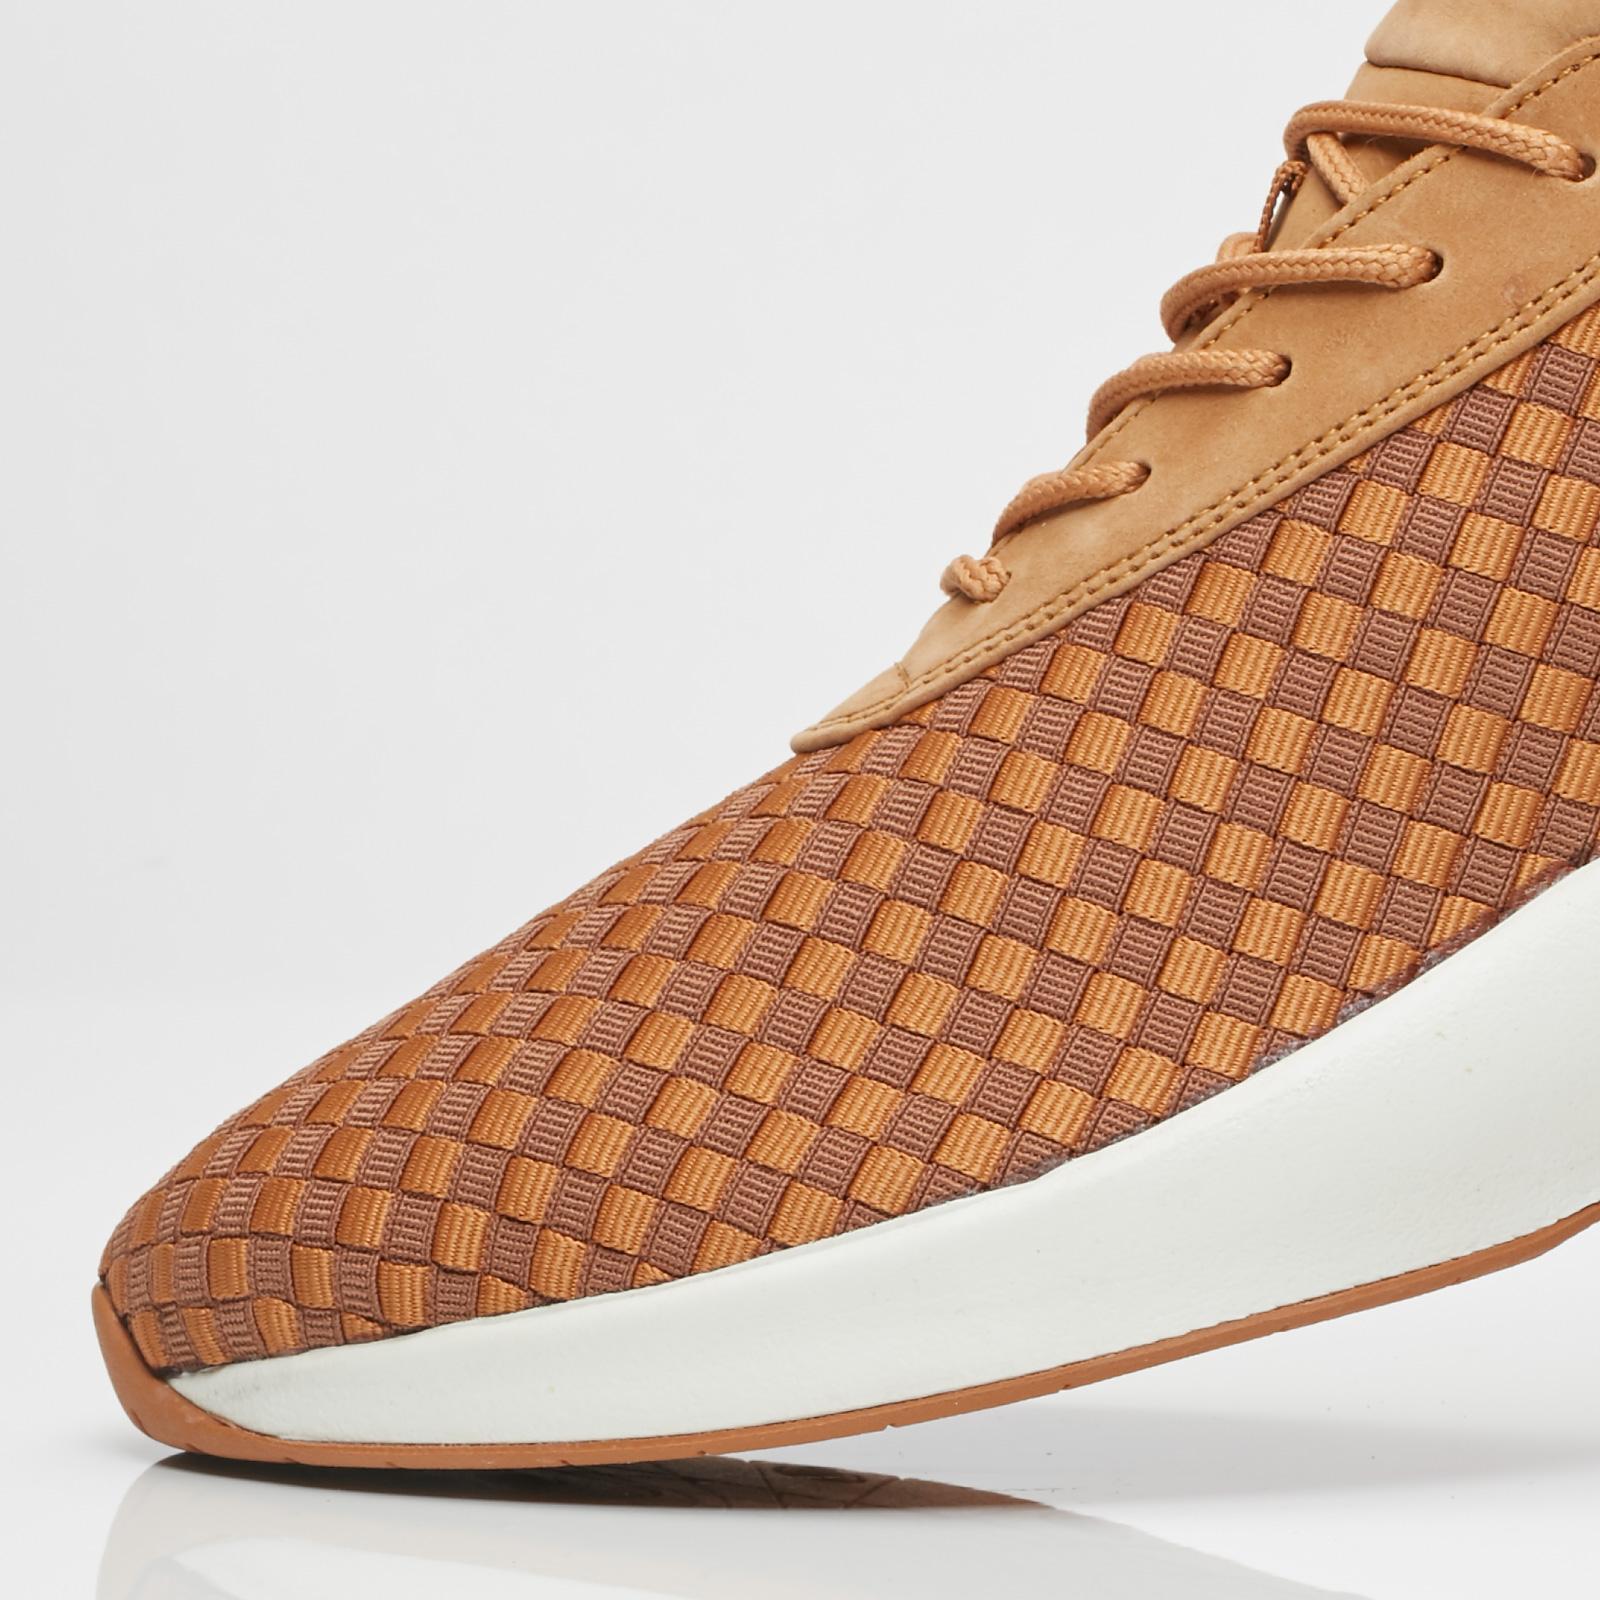 best service 48e7e fa3cd Nike Sportswear Air Woven Boot - 6. Close